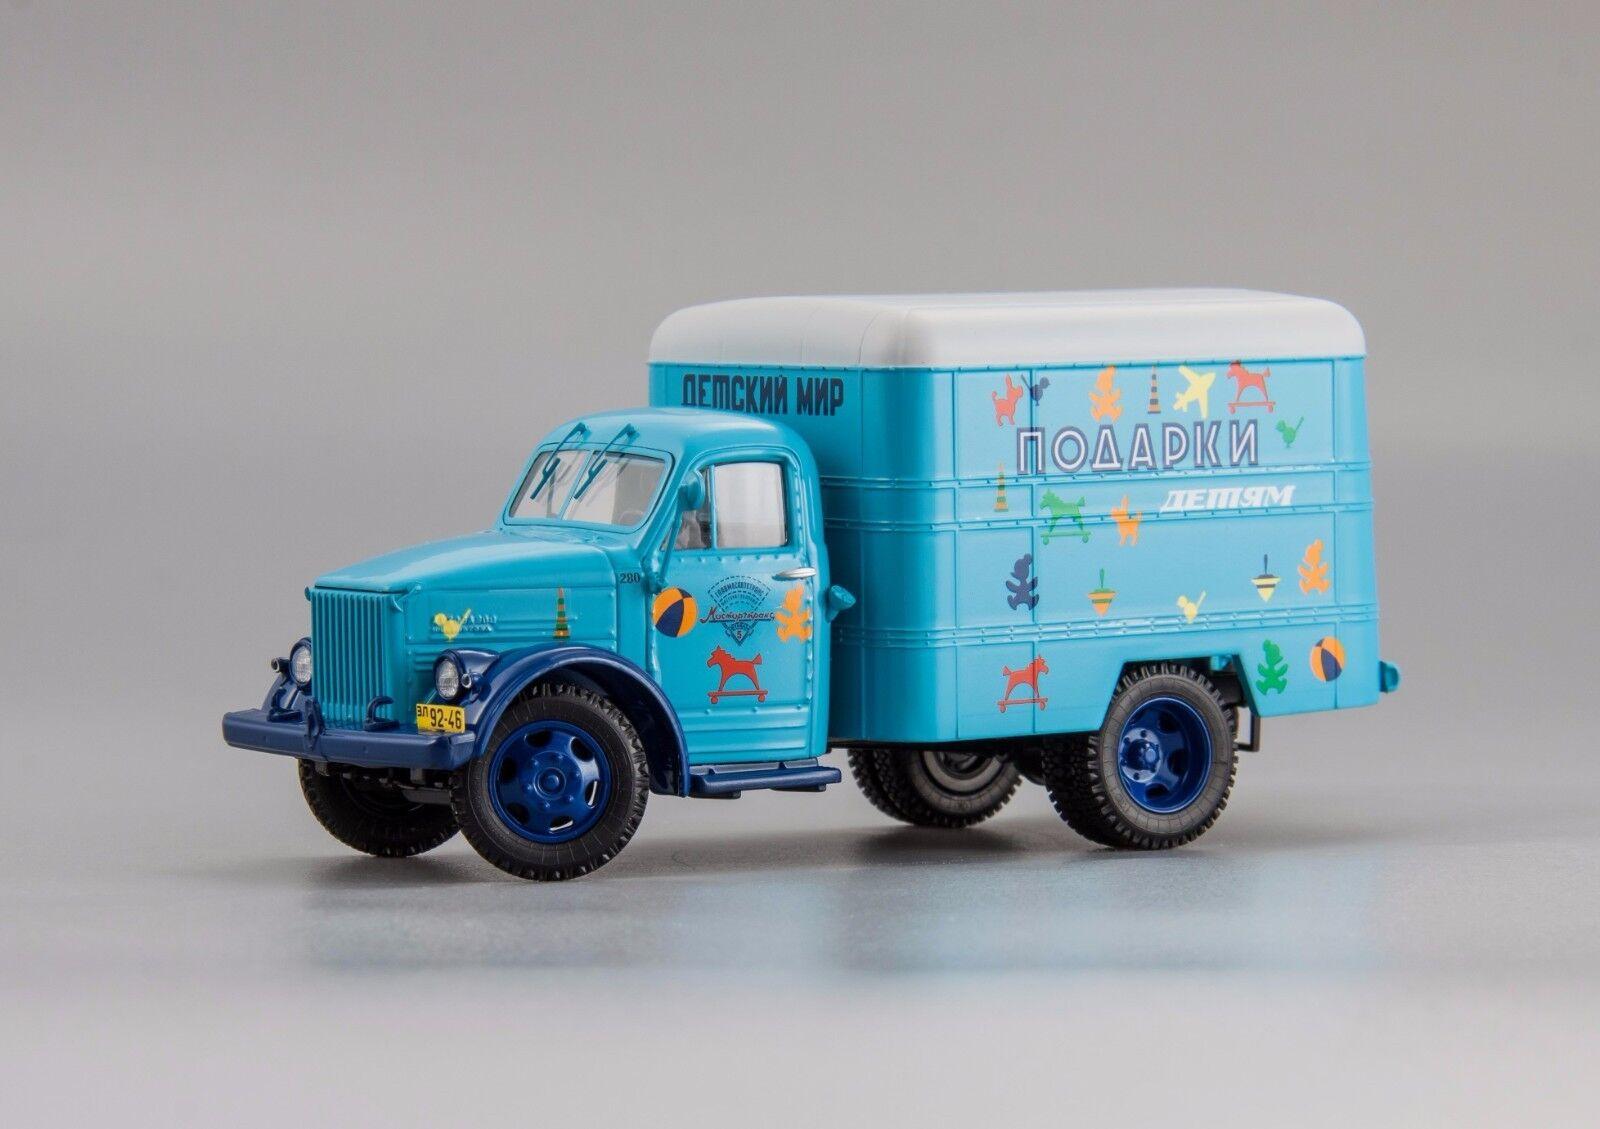 Газ - 51 фургон  подарки    gaz-51 van dip - modelle 1   43 lim.300 stk. selten